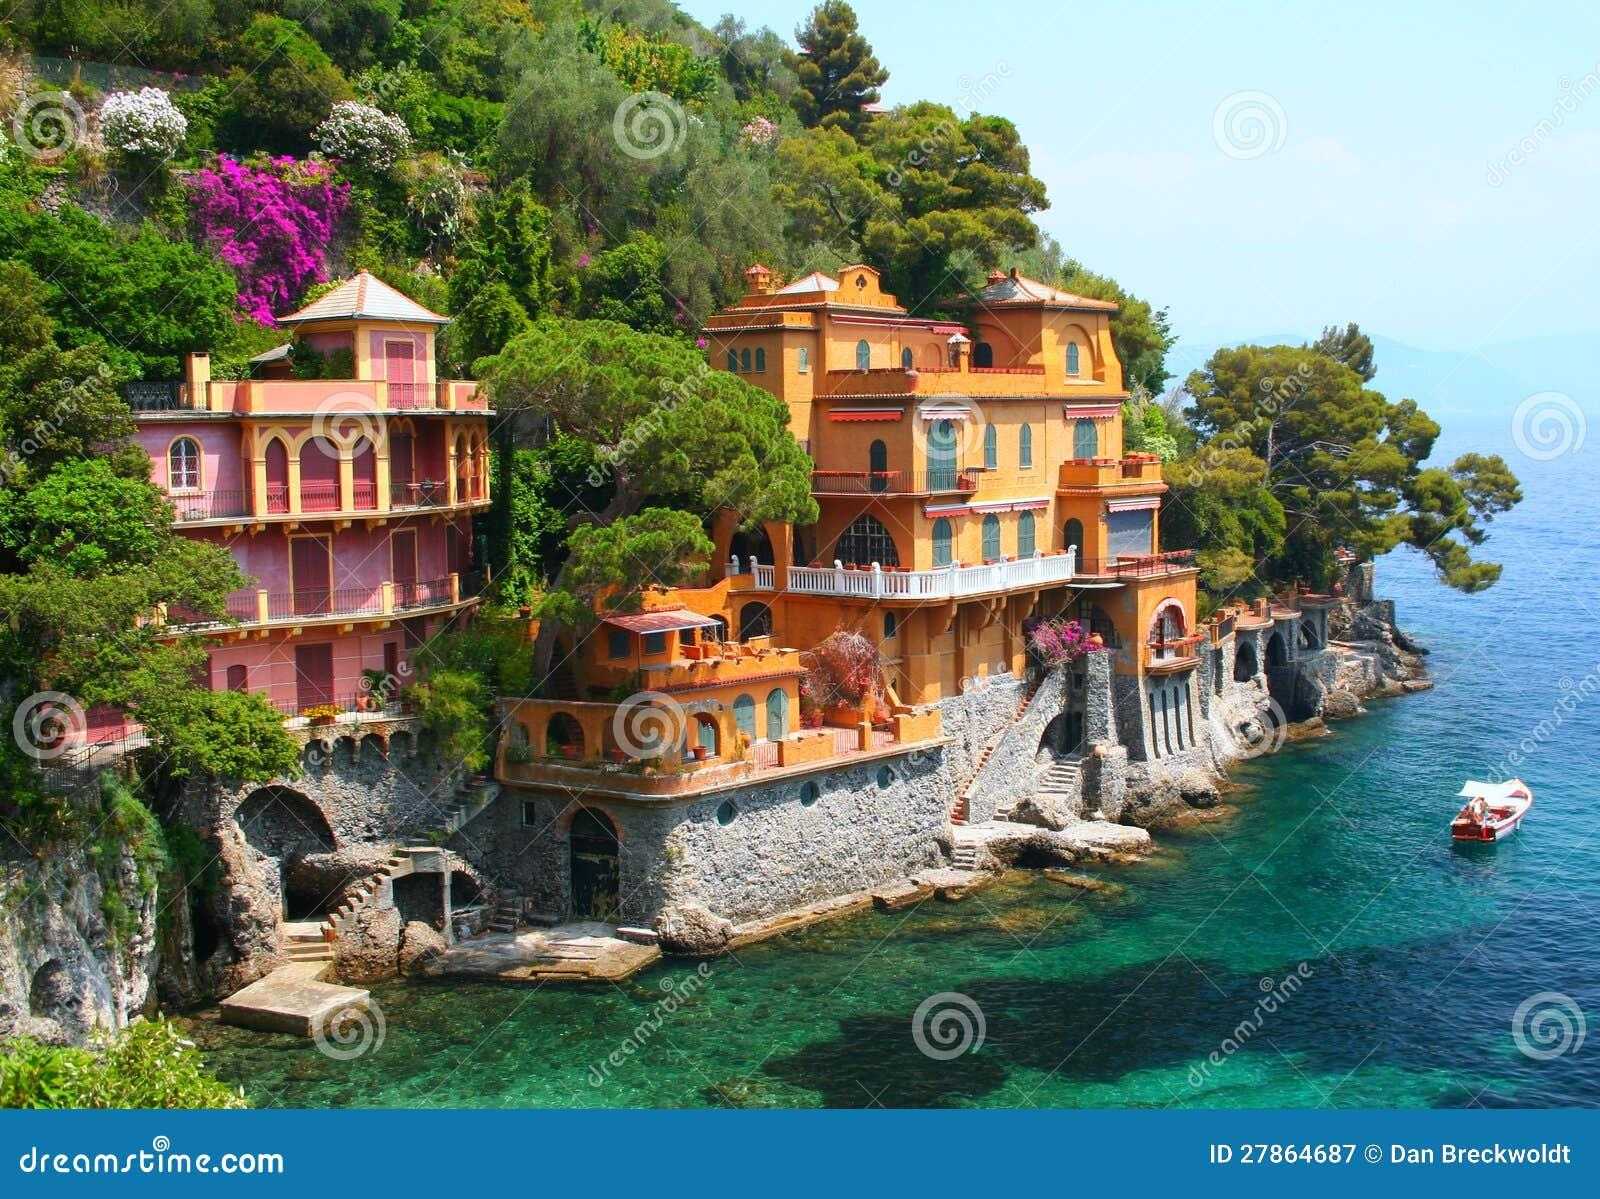 villas de bord de la mer en italie photographie stock libre de droits image 27864687. Black Bedroom Furniture Sets. Home Design Ideas